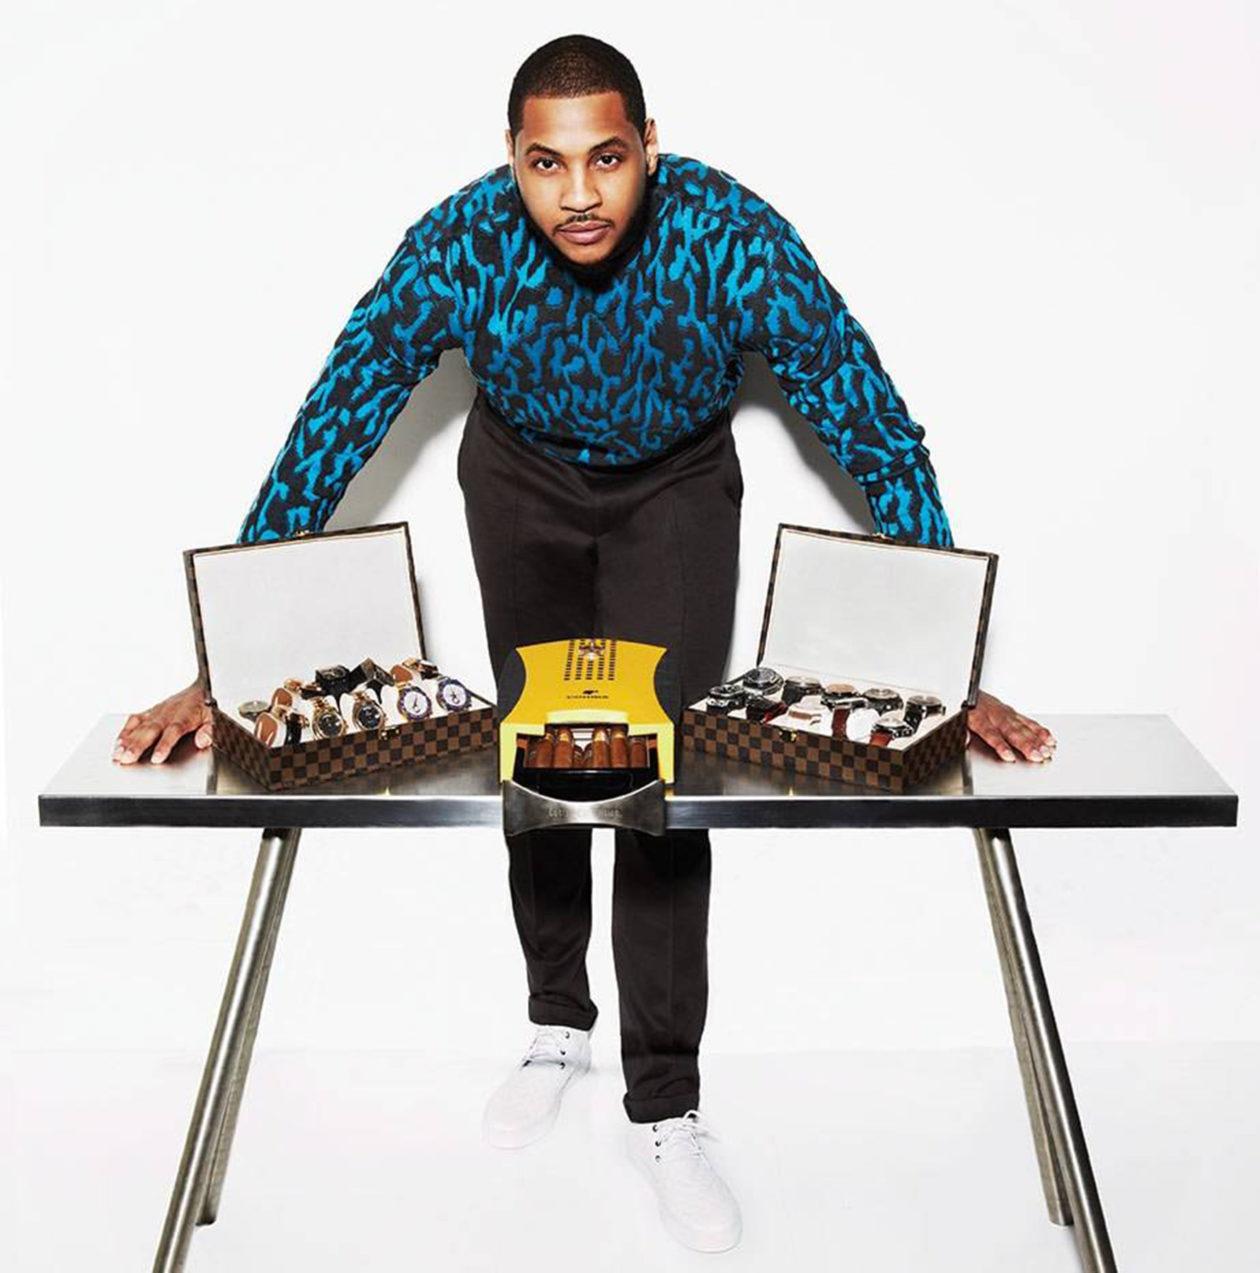 Carmelo Anthony / foto: hautetime.com